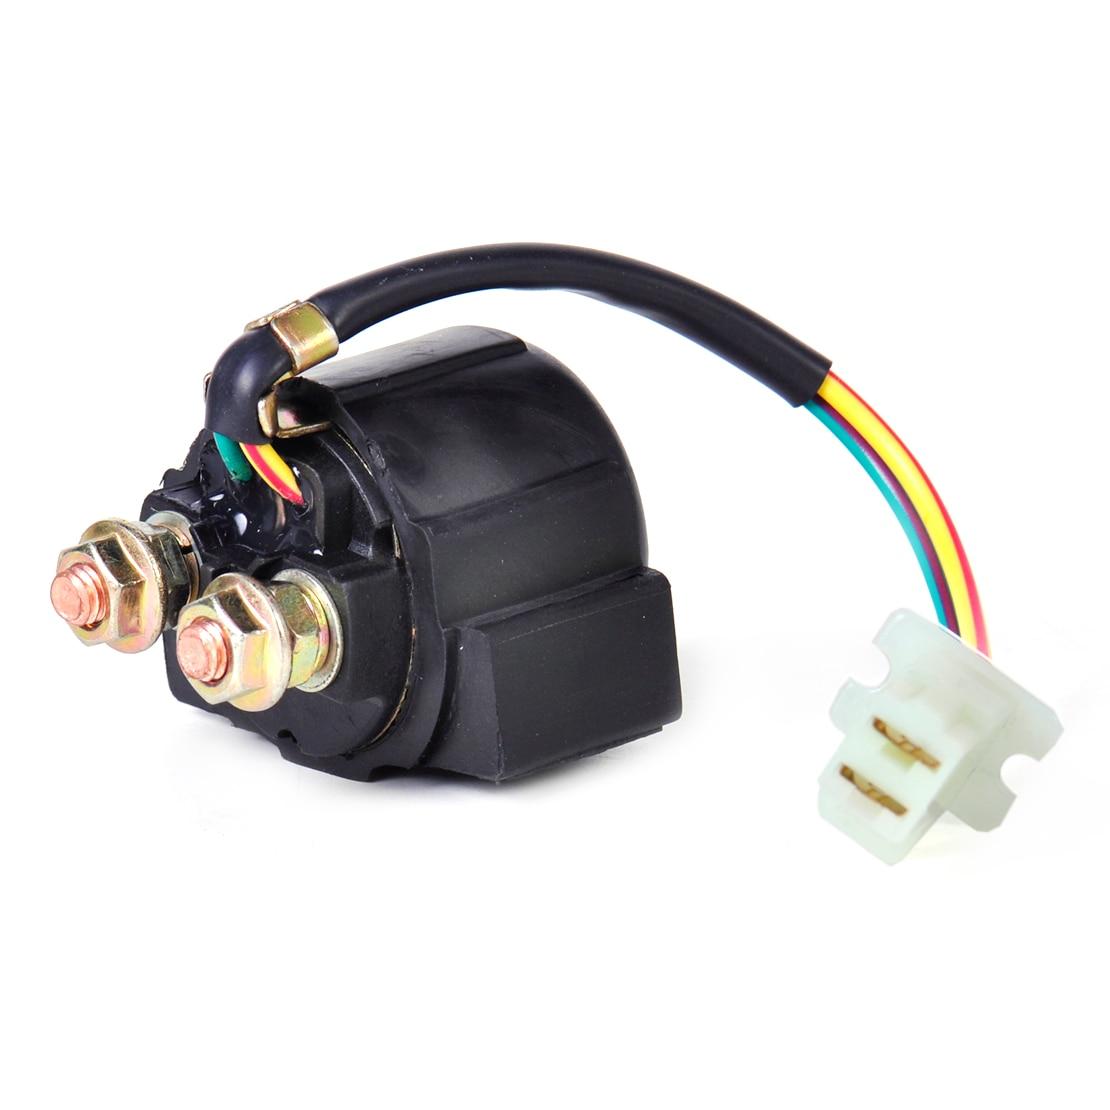 hight resolution of citall 2 wire plug connection starter relay solenoid for yamaha yfm350 xv750 sr185 warrior honda atv 300 trx250 suzuki dr200se in motorbike ingition from